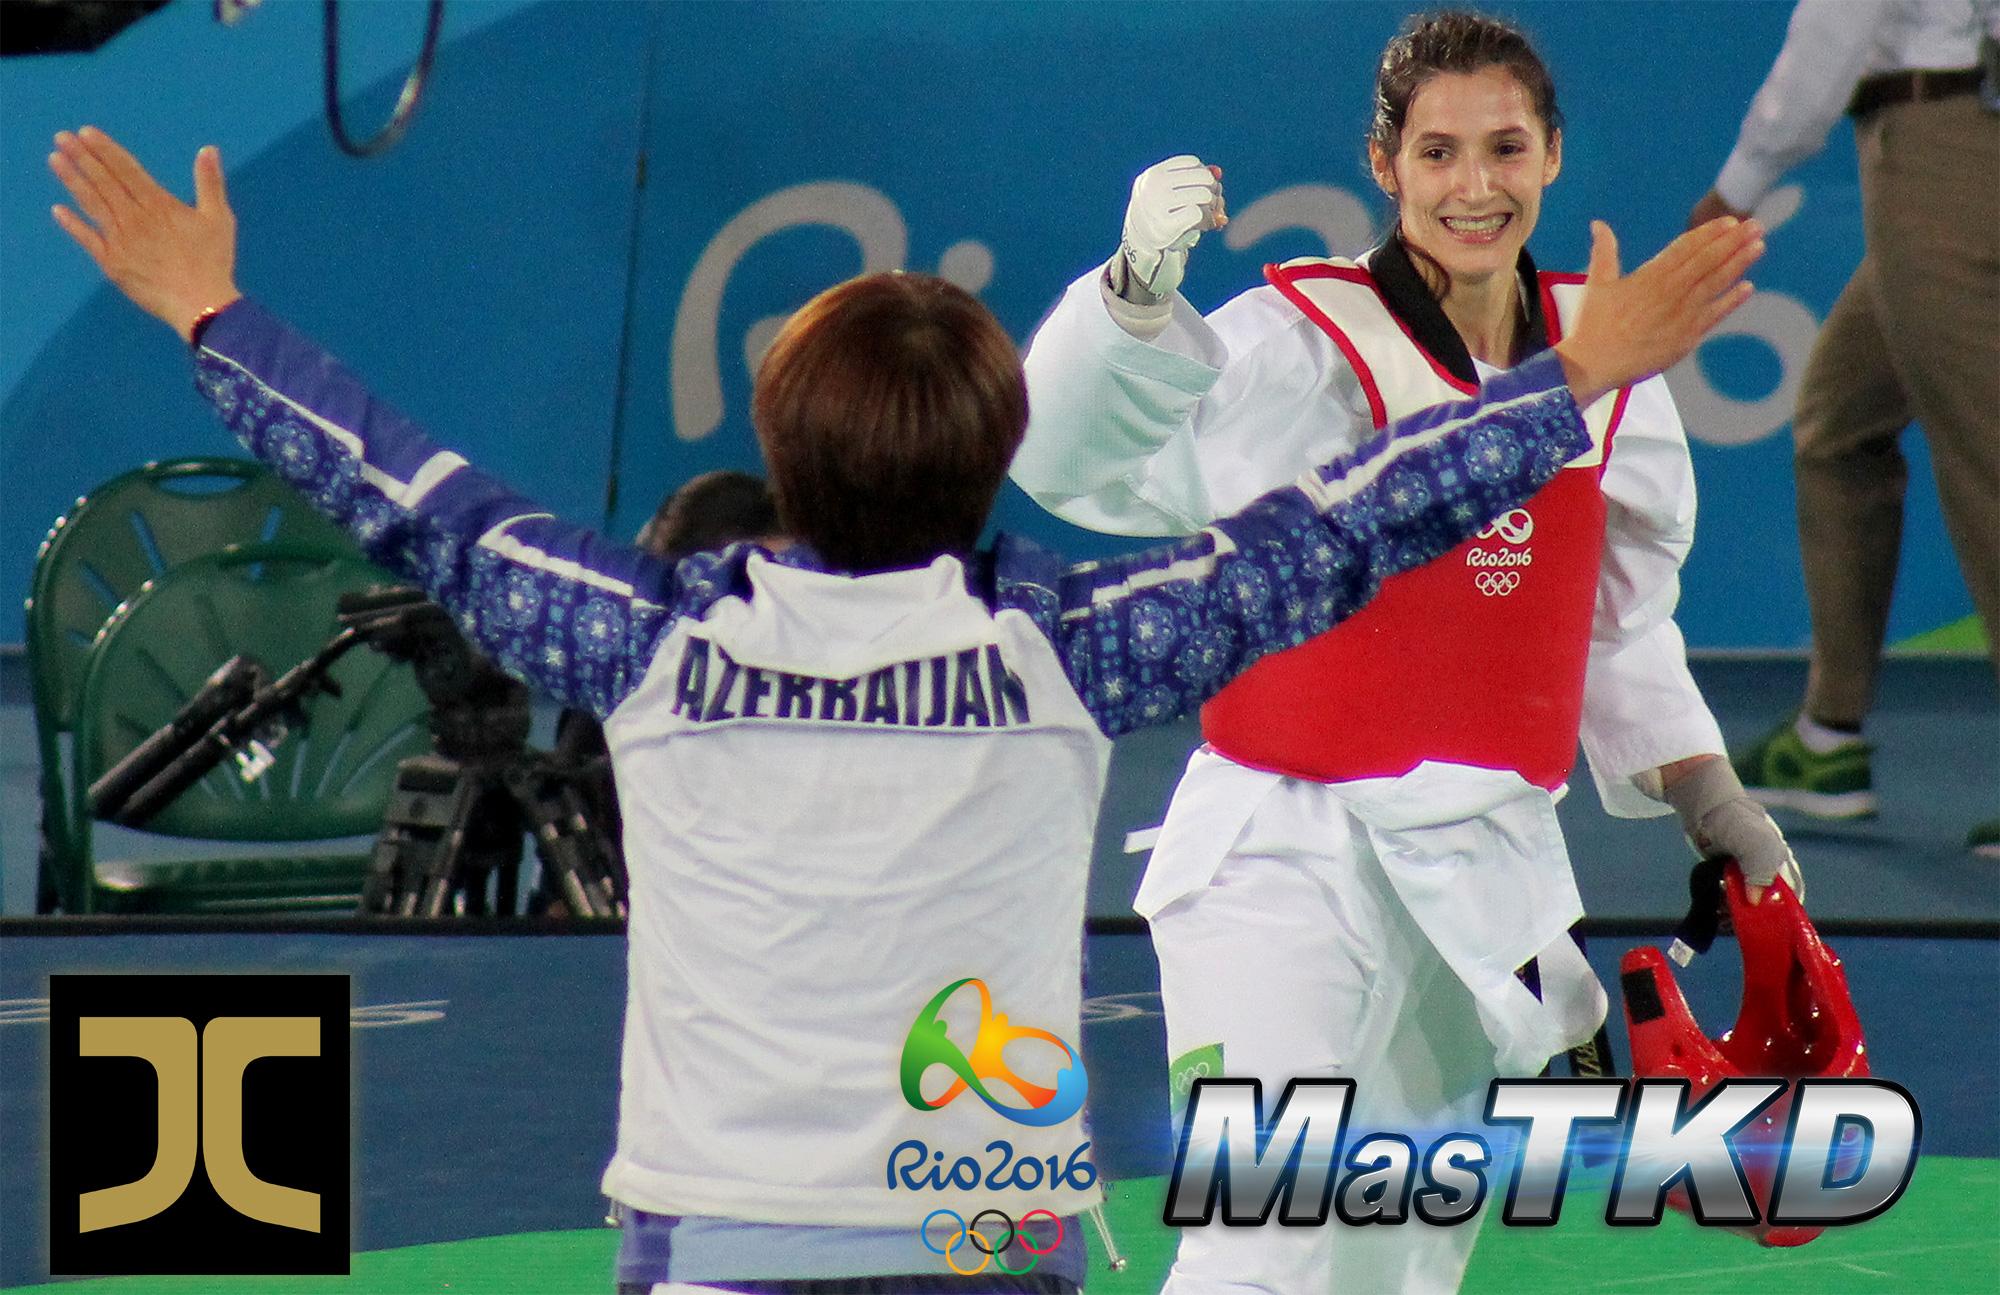 20160817_Taekwondo_JC_masTKD_Rio2016_10